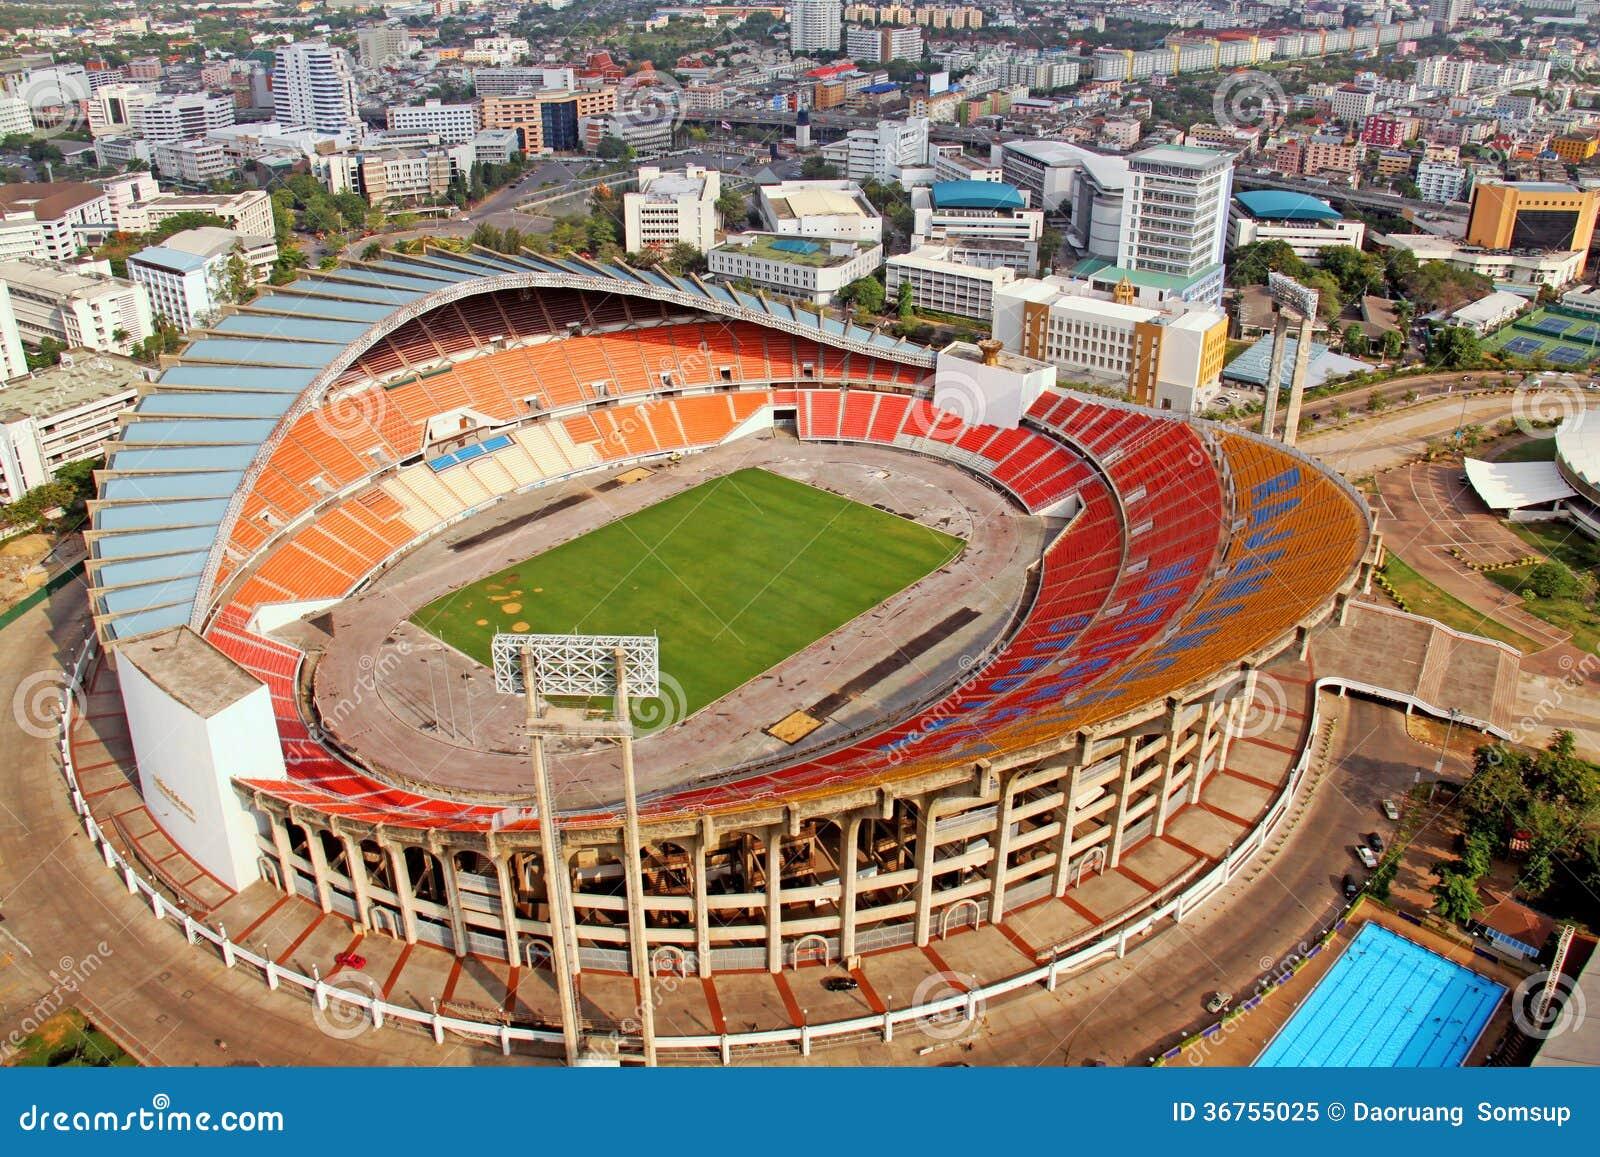 rajamangala stadium editorial image image 36755025 free football field images clip art soccer field clipart free